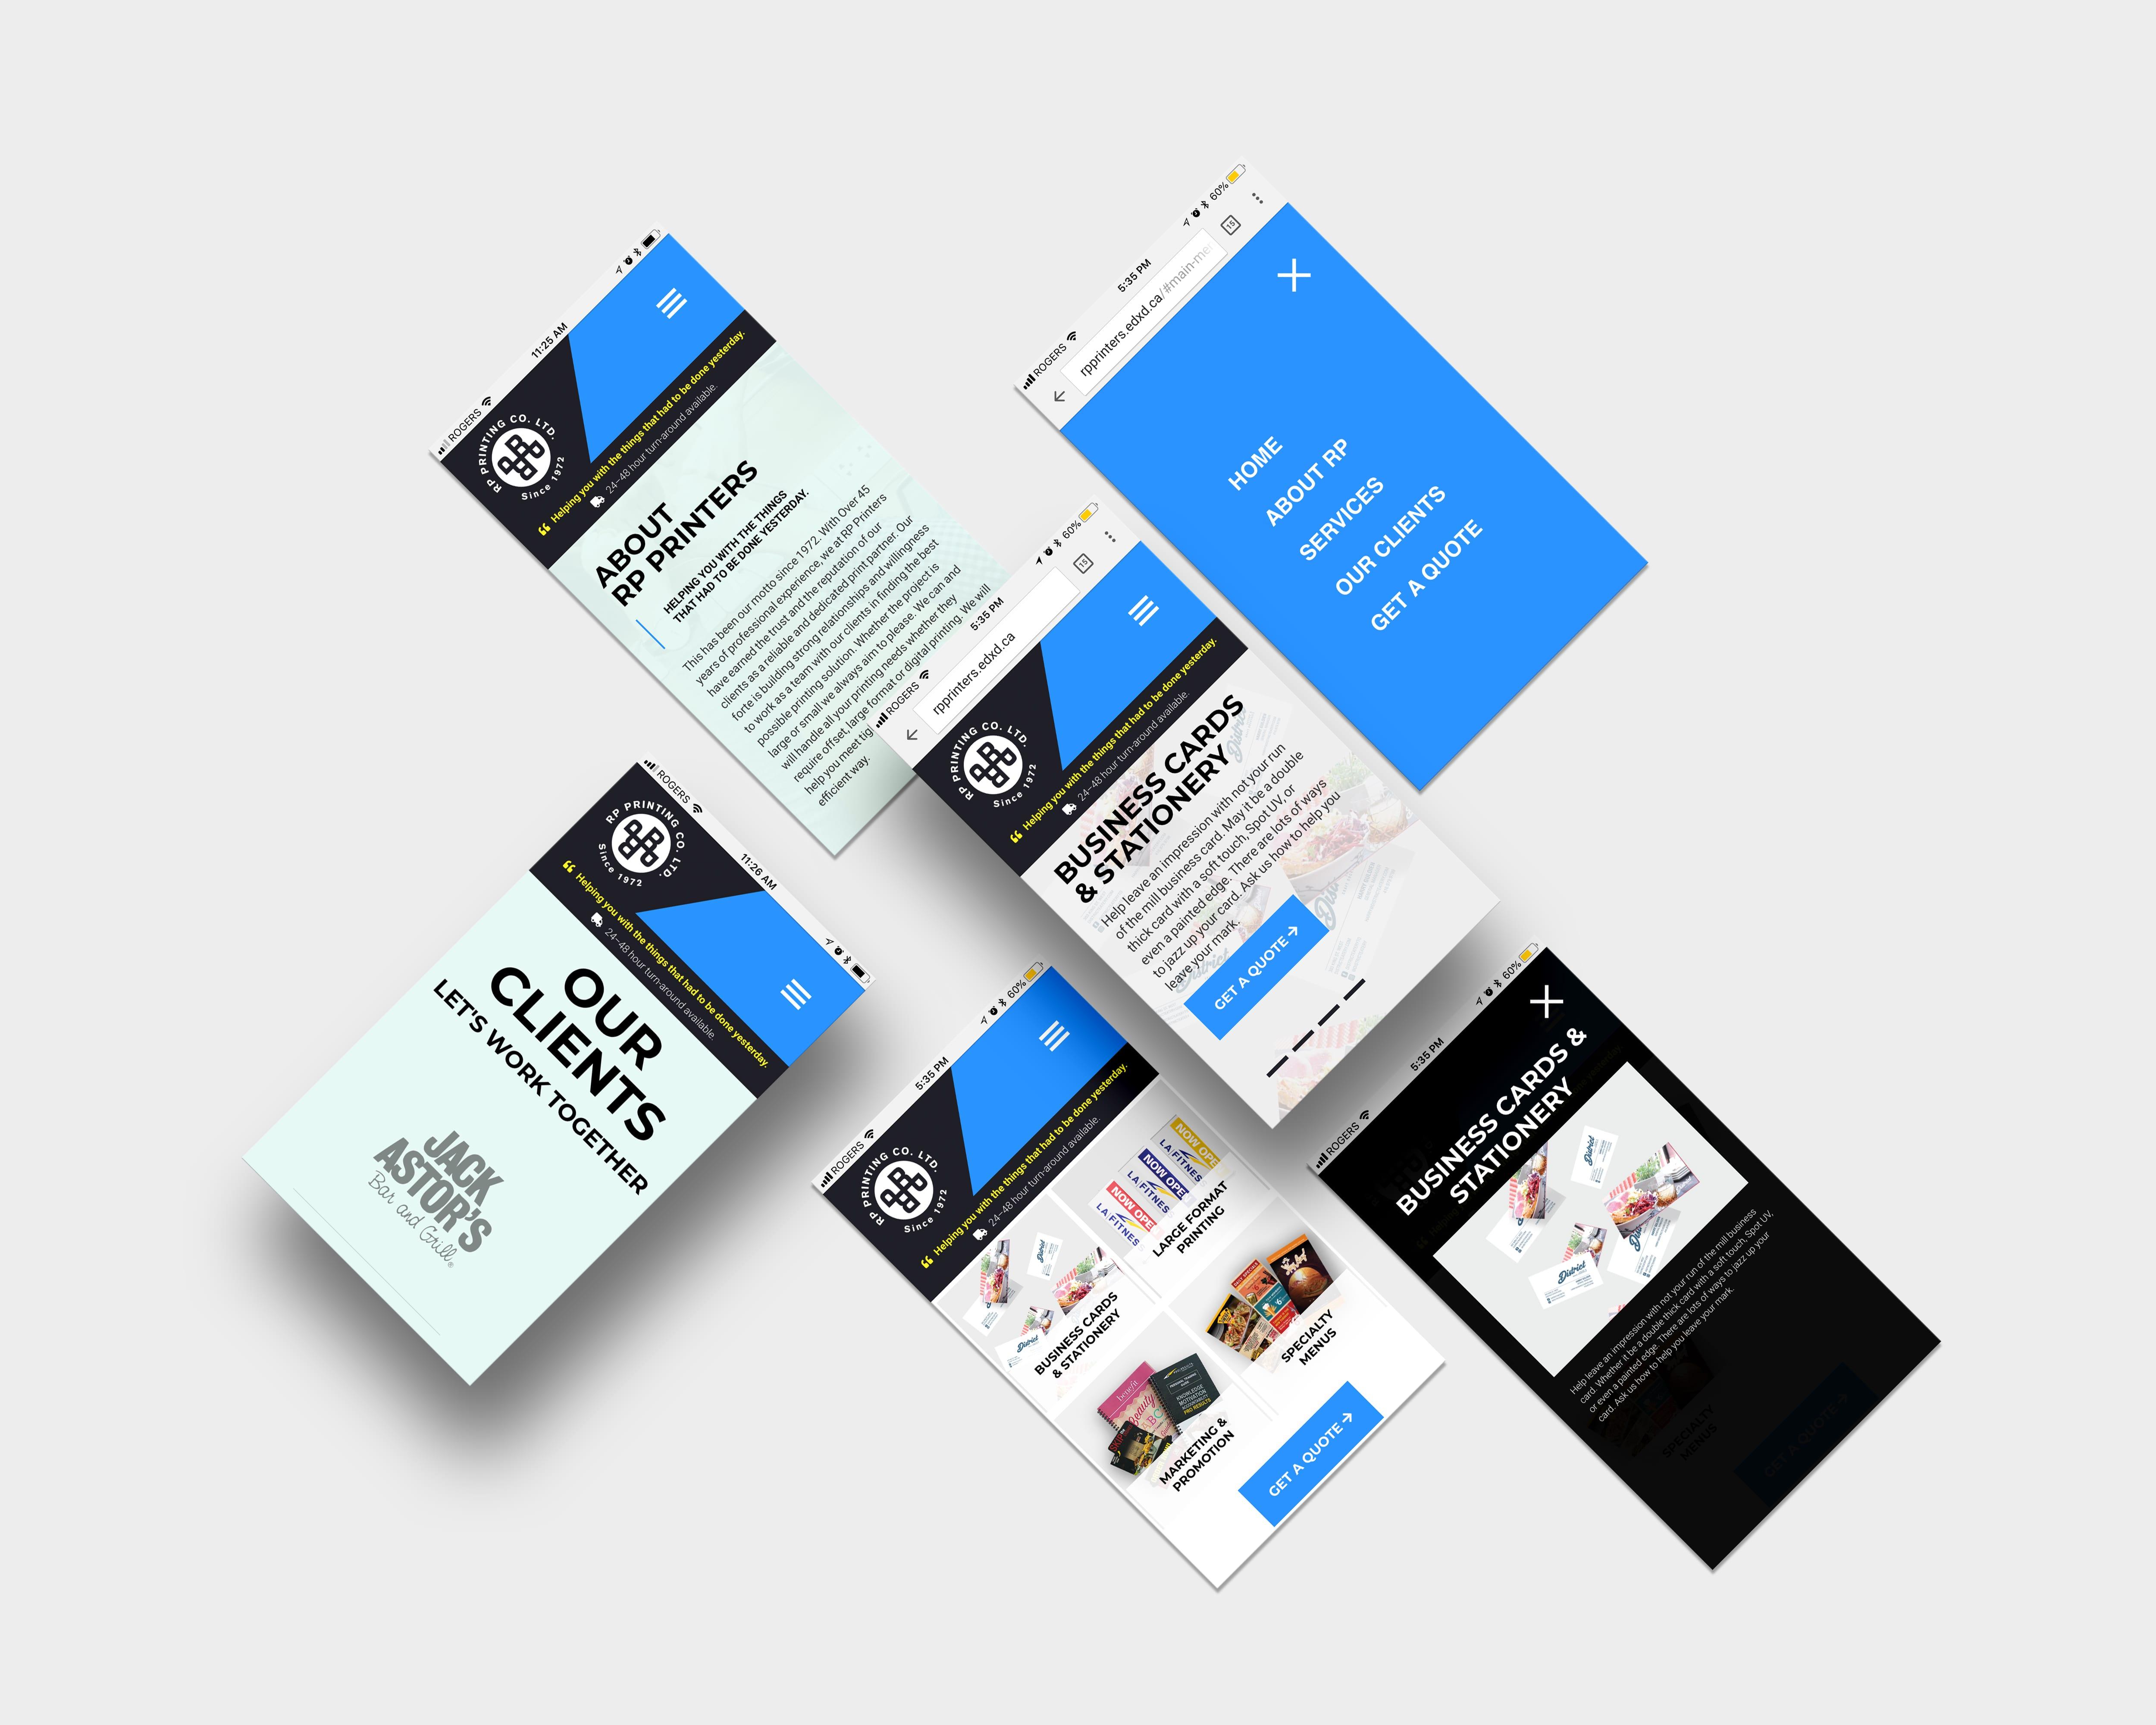 RP Printers Responsive Web Design